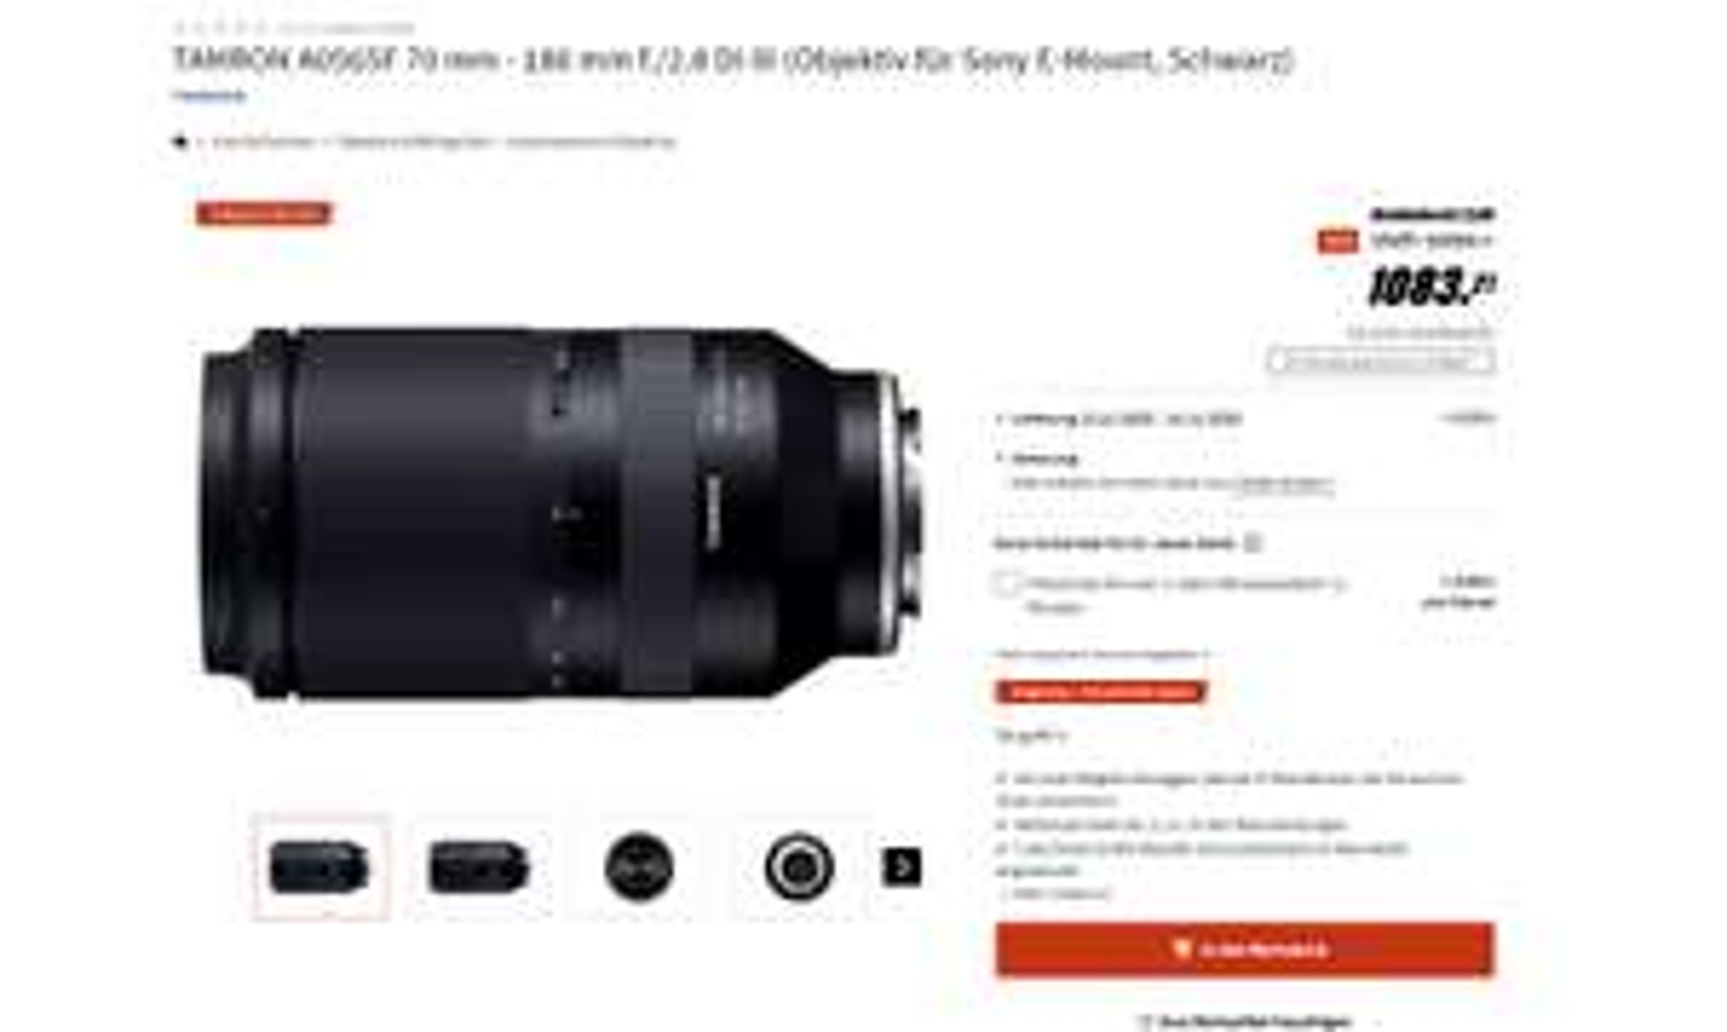 TAMRON 70 mm - 180 mm f./2.8 Di III Media Markt / Saturn Singles Day / E-Mount